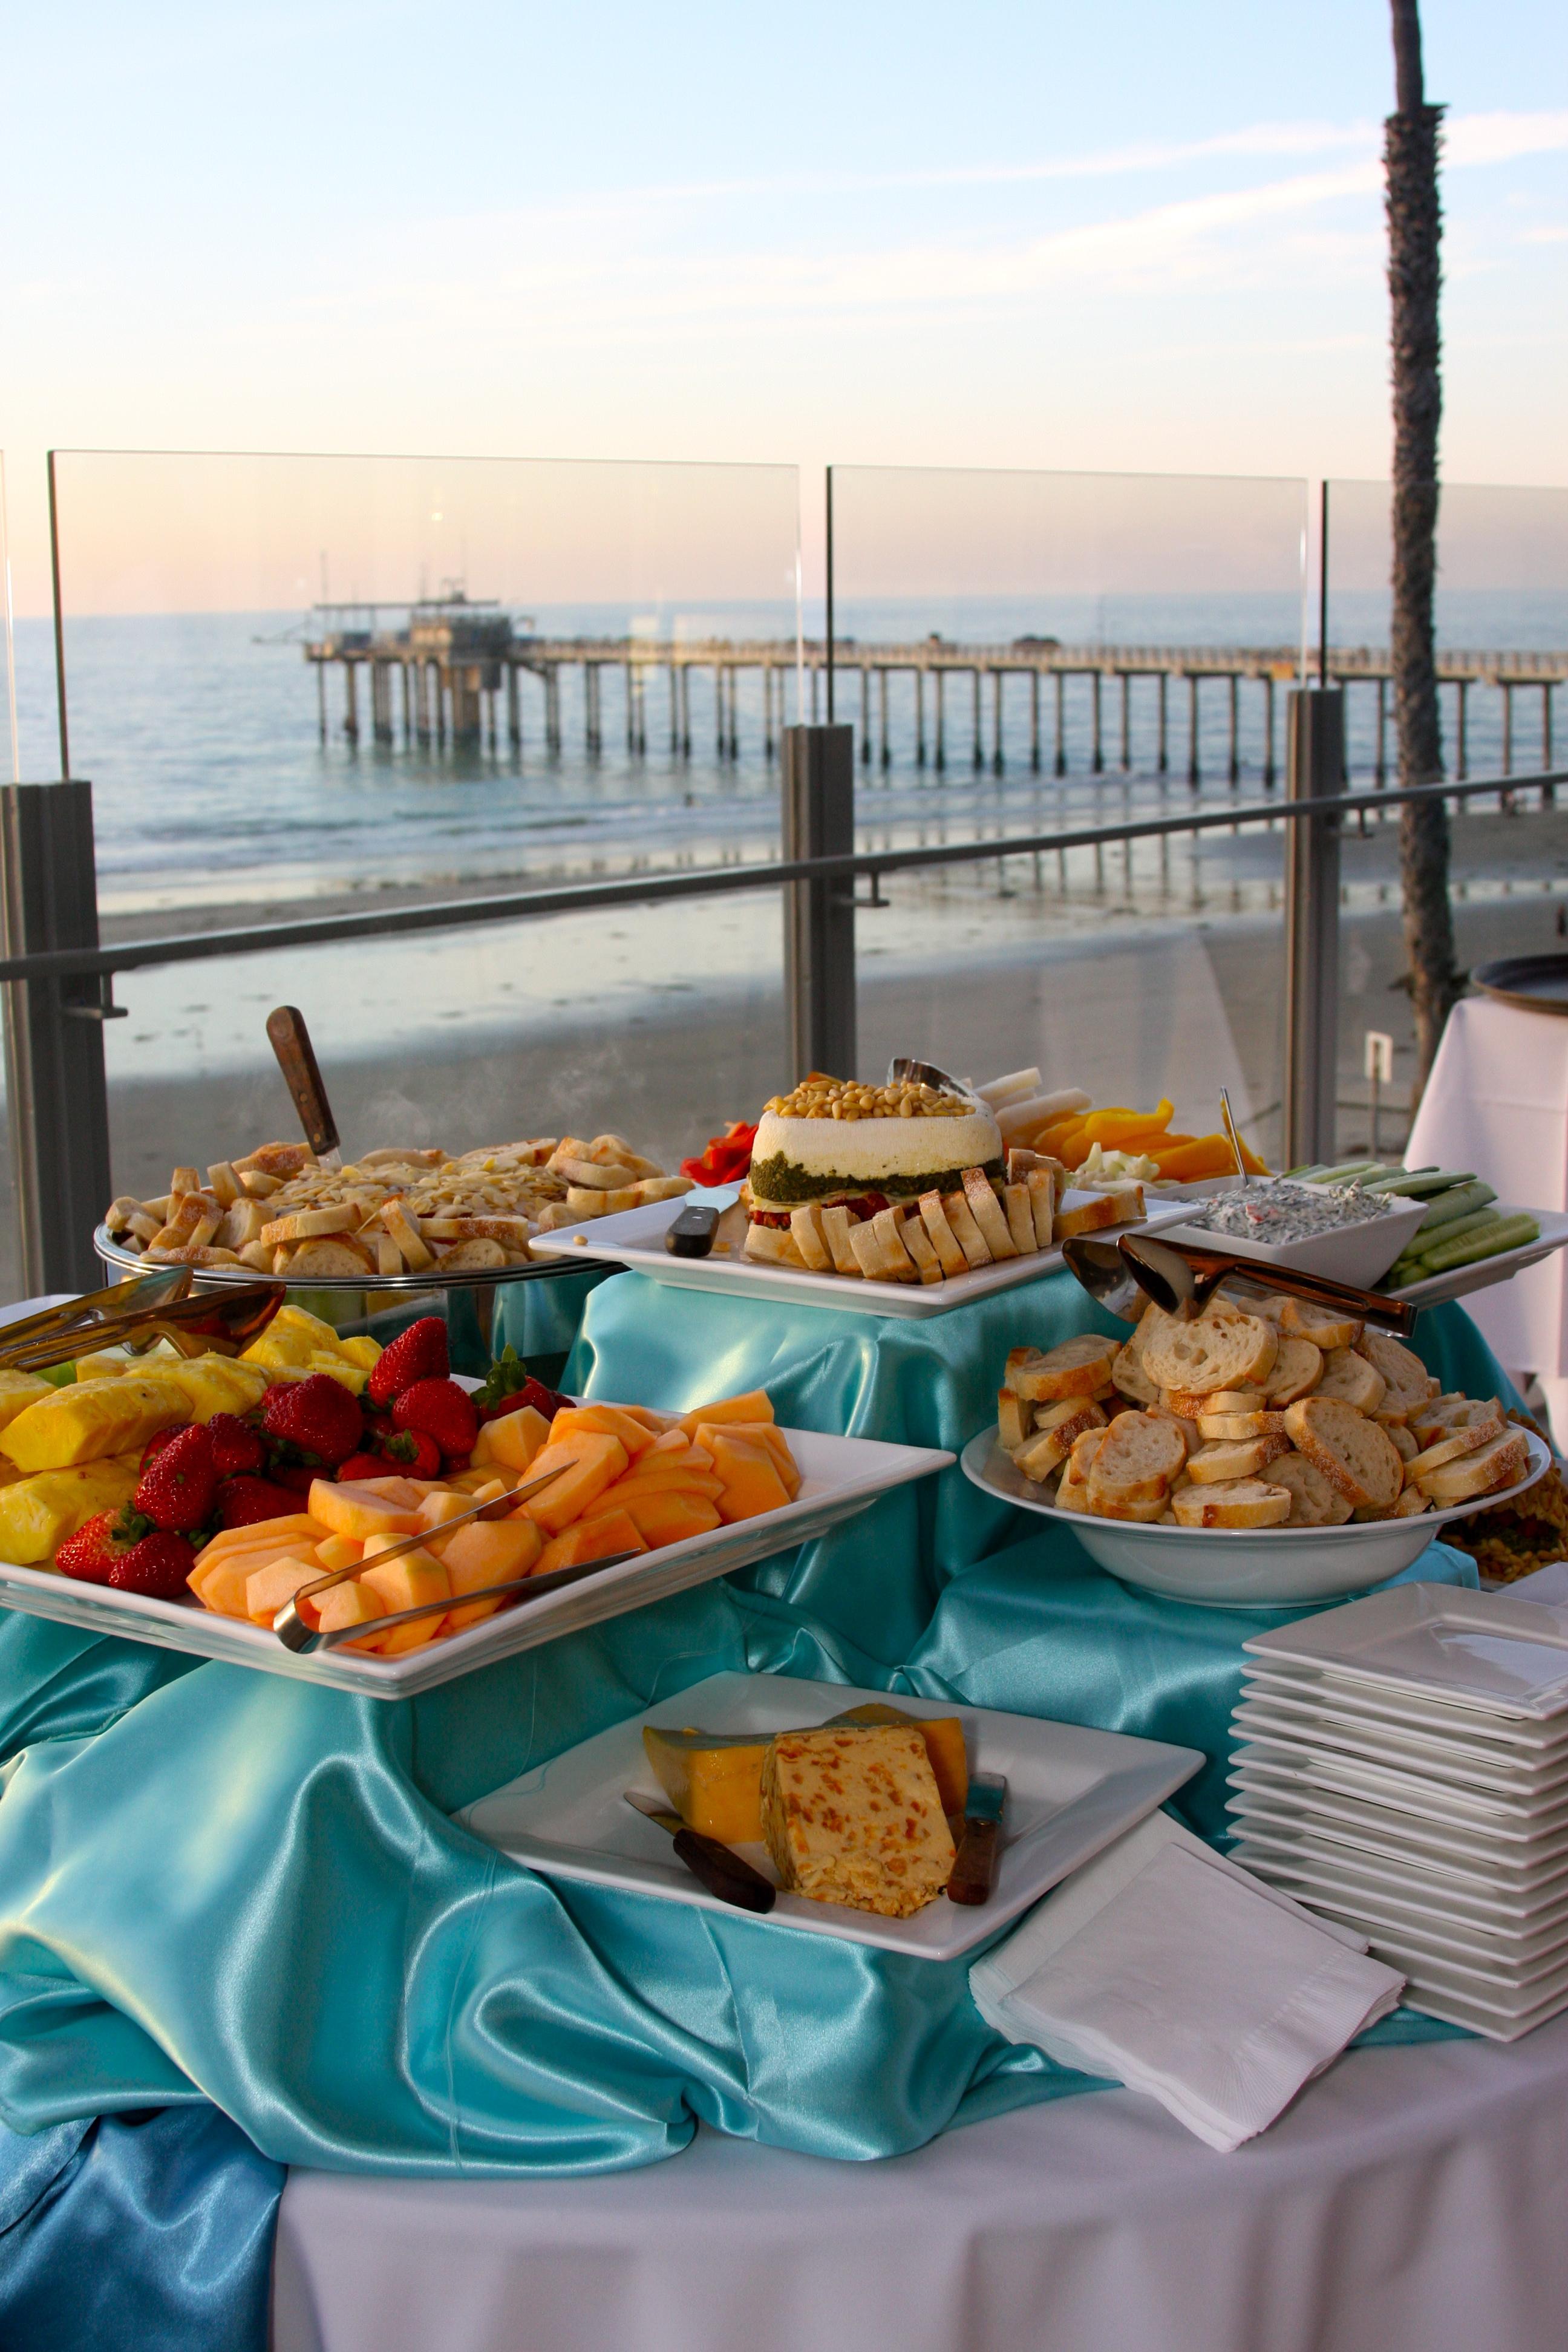 Scripps Seaside Forum, La Jolla CA